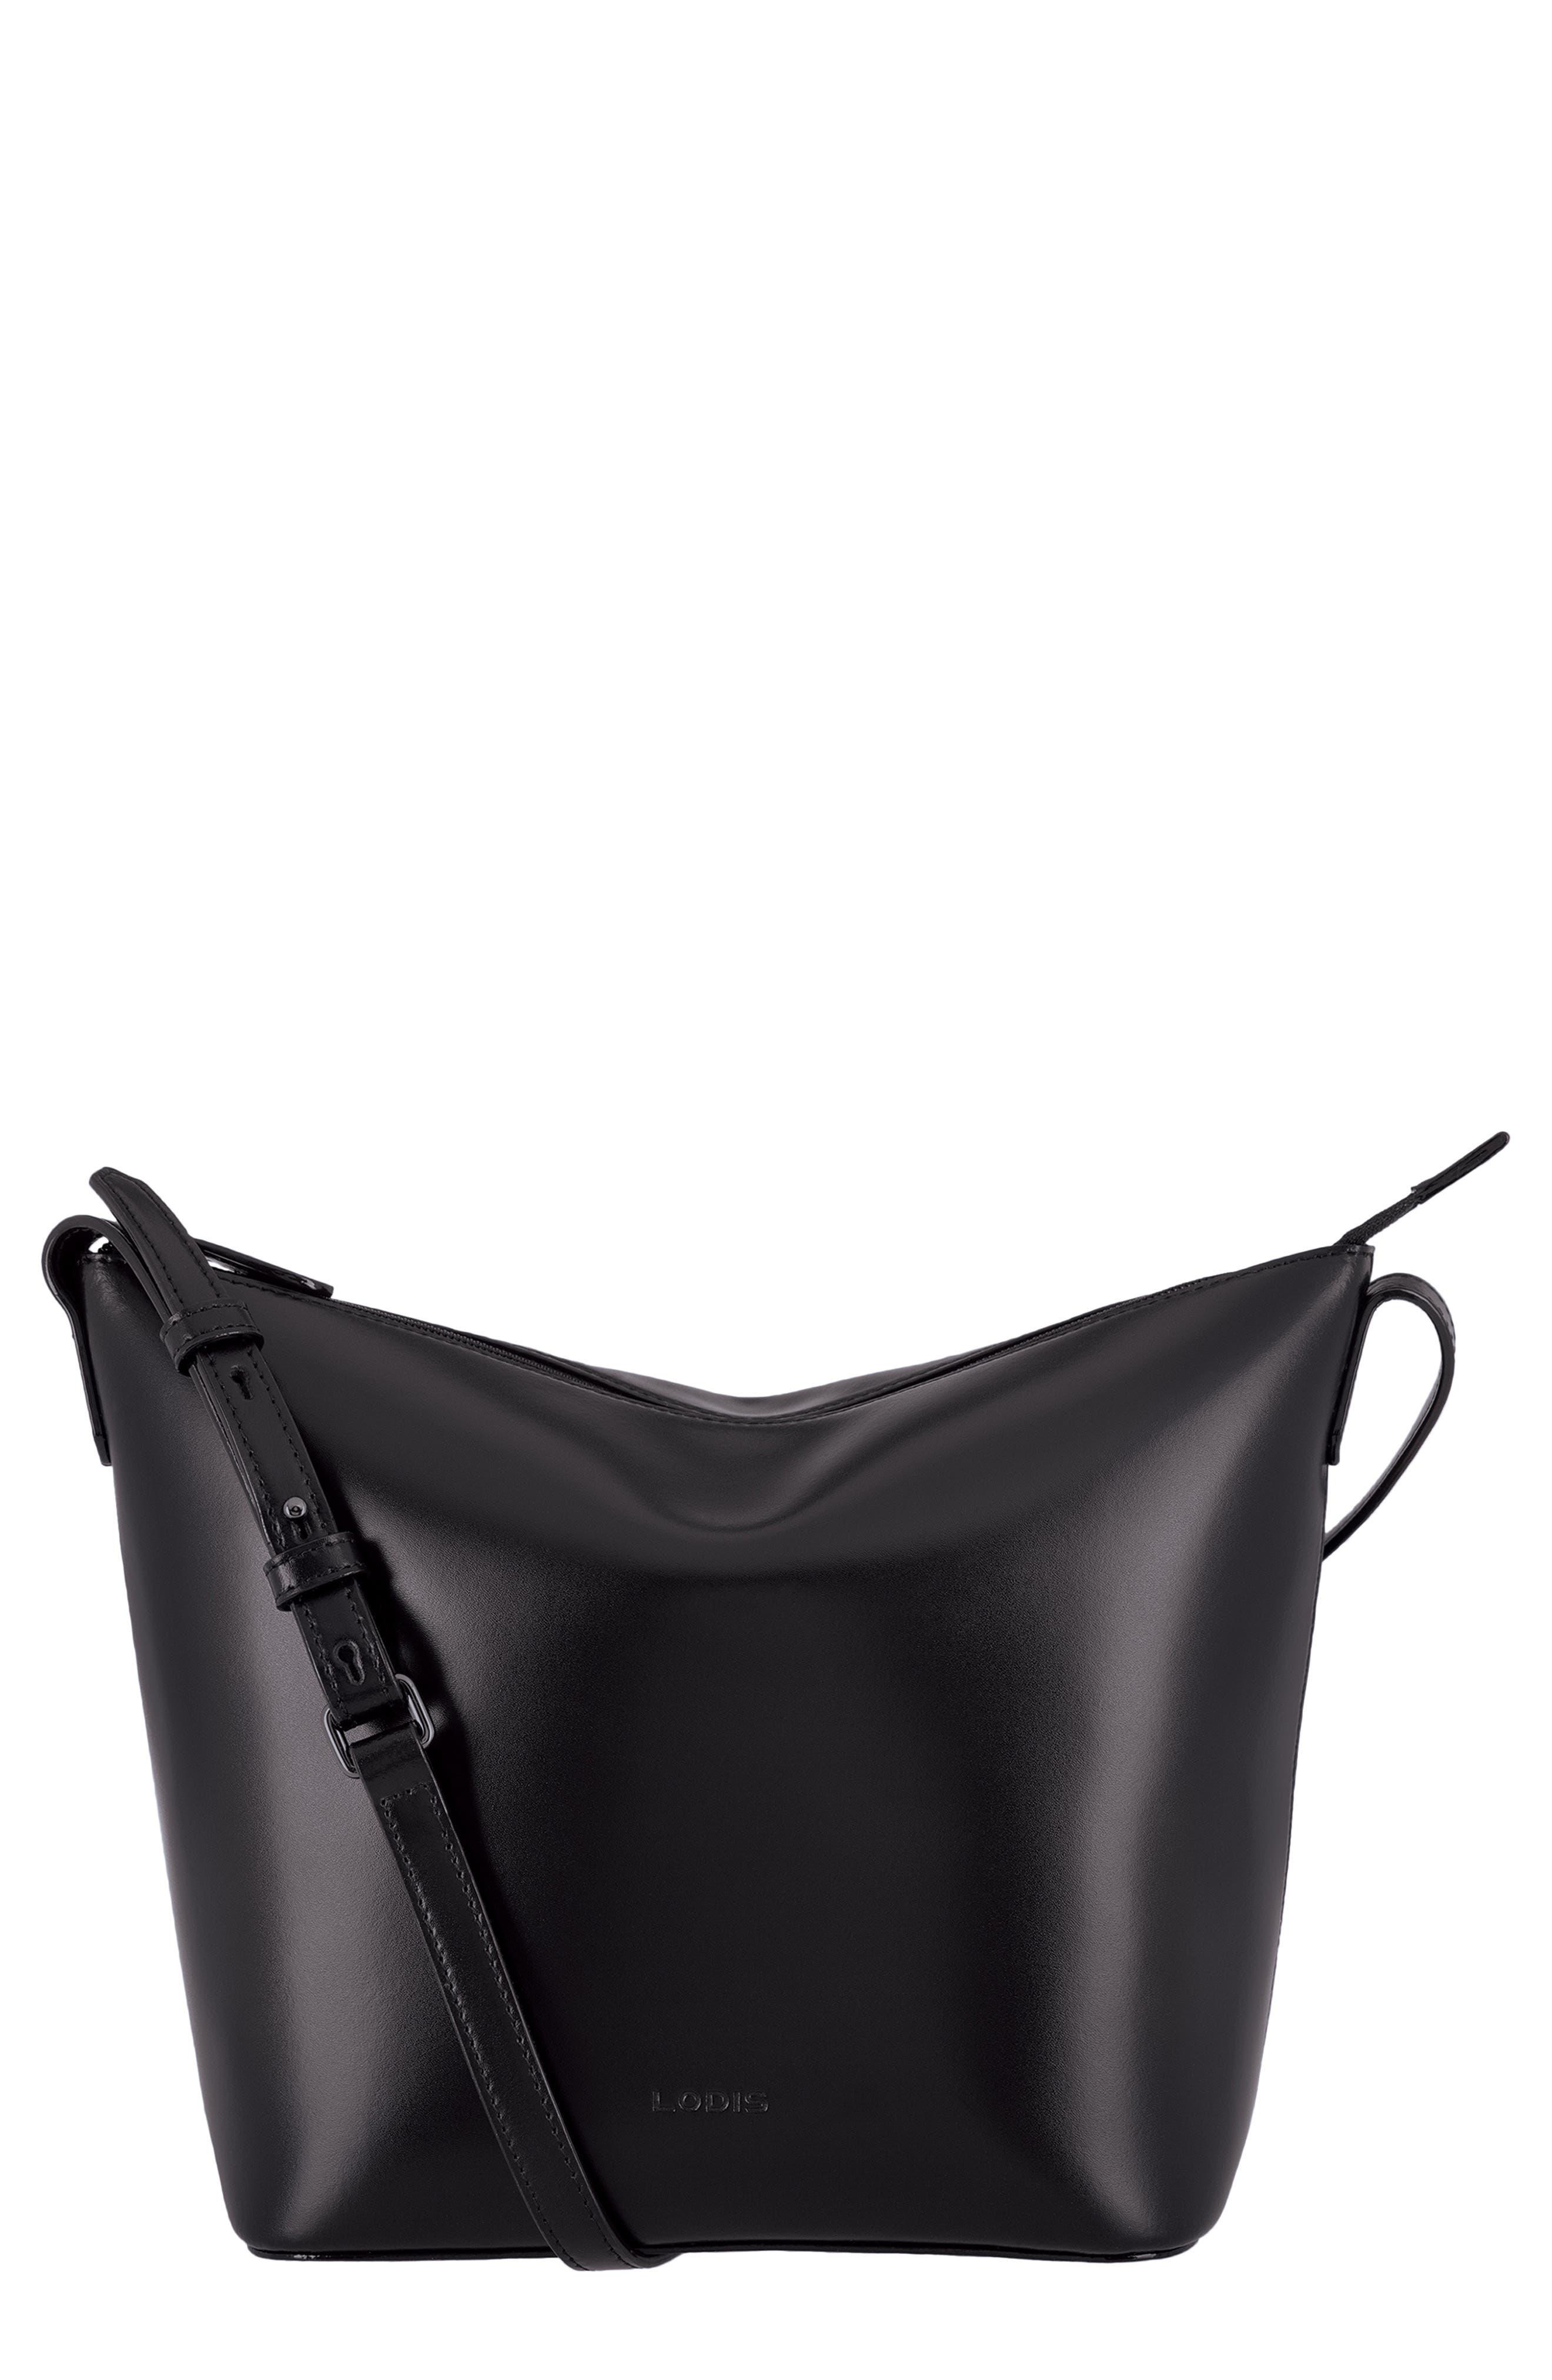 Camilla RFID Leather Crossbody Bucket Bag,                             Main thumbnail 1, color,                             BLACK/ BLACK